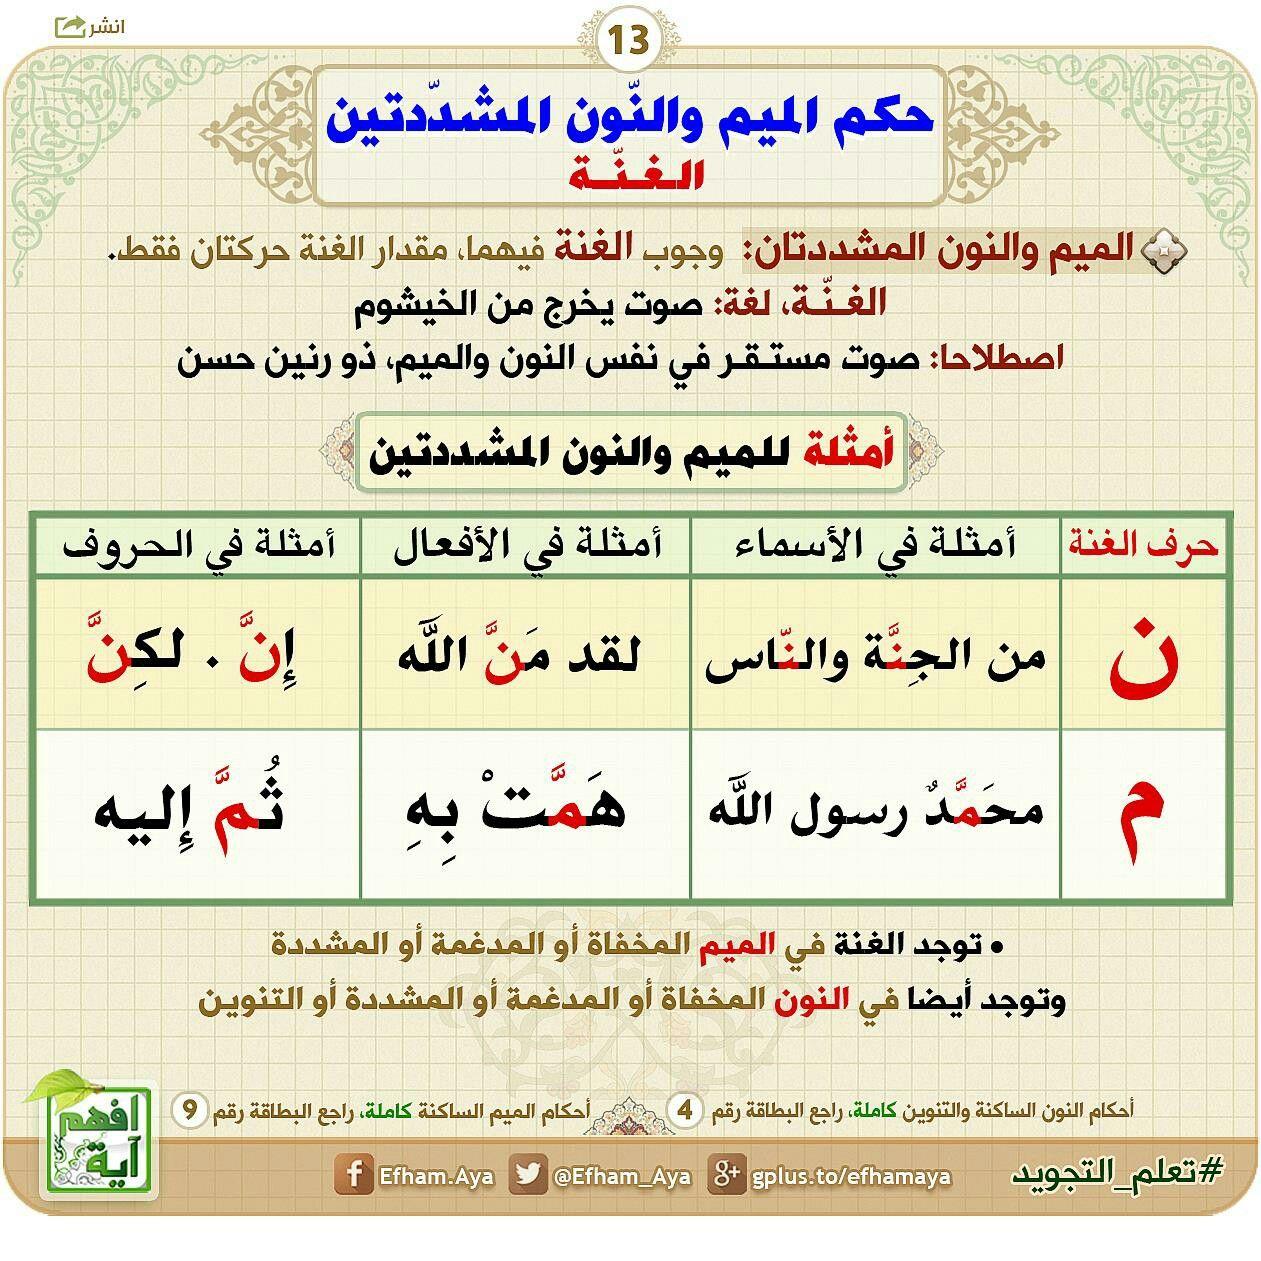 Pin By Shaimaa On كن من الذاكرين الله Tajweed Quran Quran Verses Learn Arabic Language